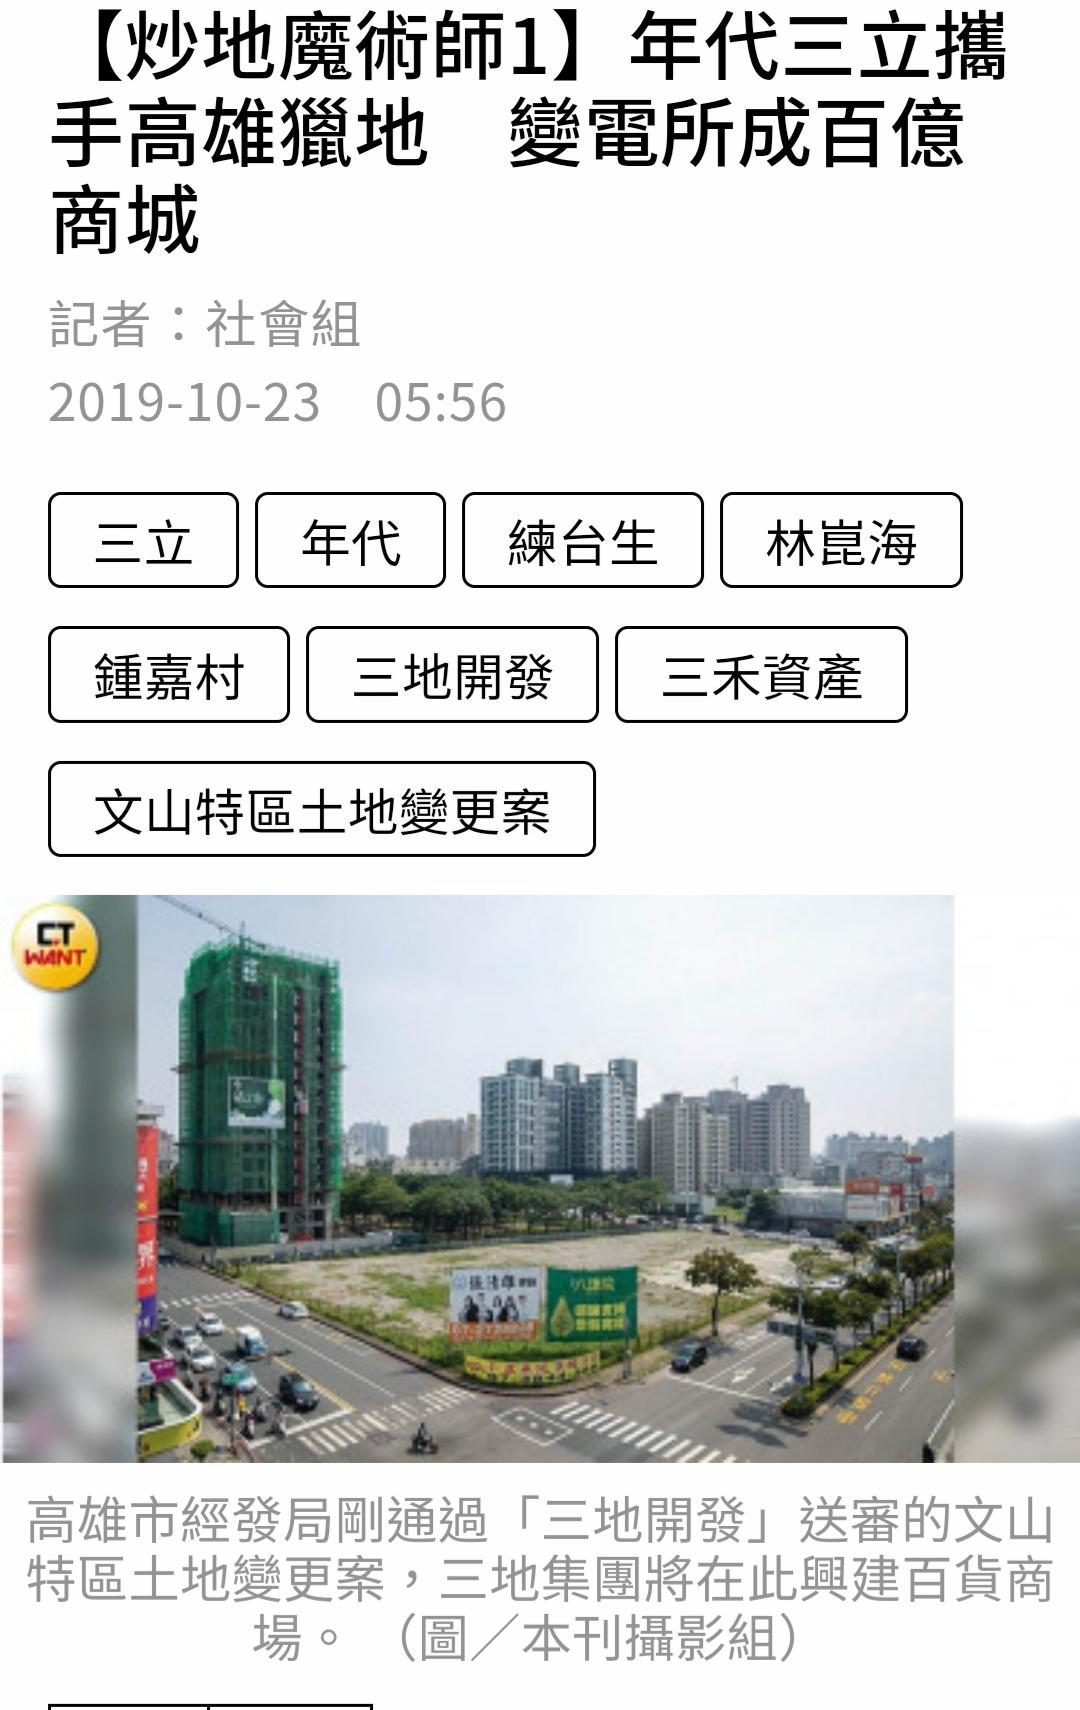 Re: [新聞] 8.5億成交!台南武聖夜市賣給建商蓋大樓